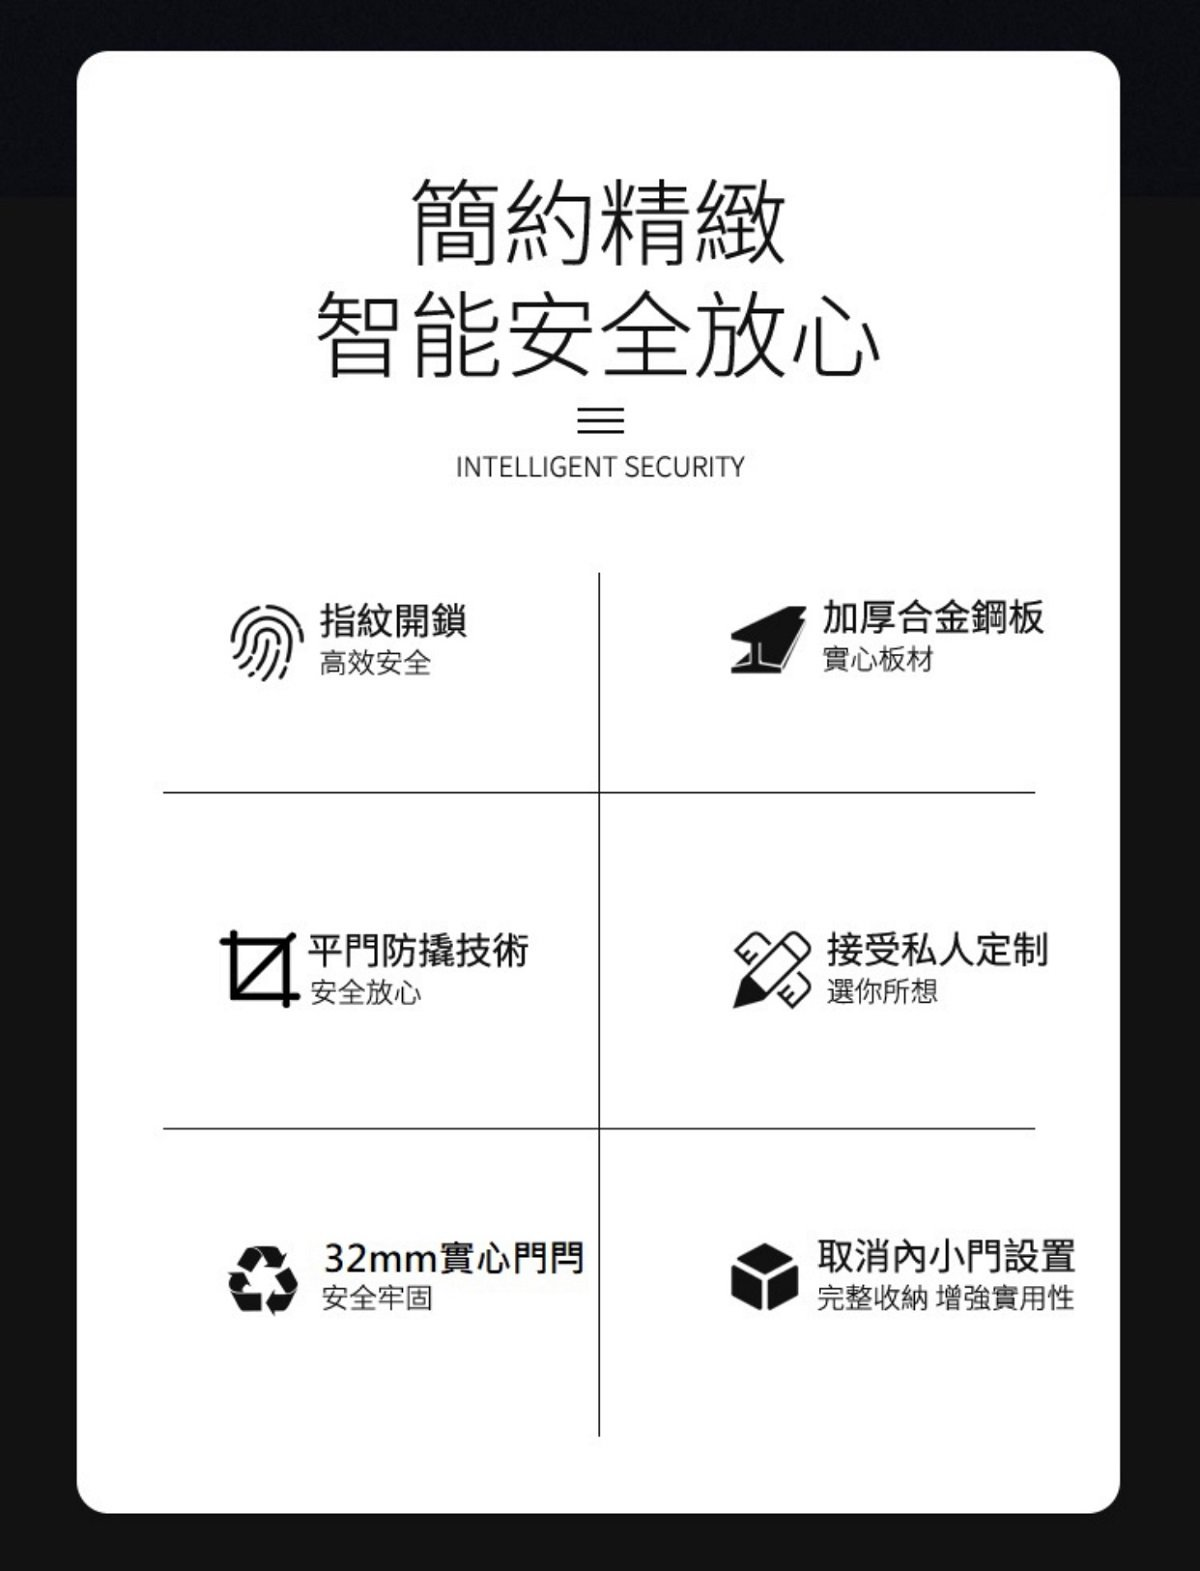 Marketing graphic-PB70-2